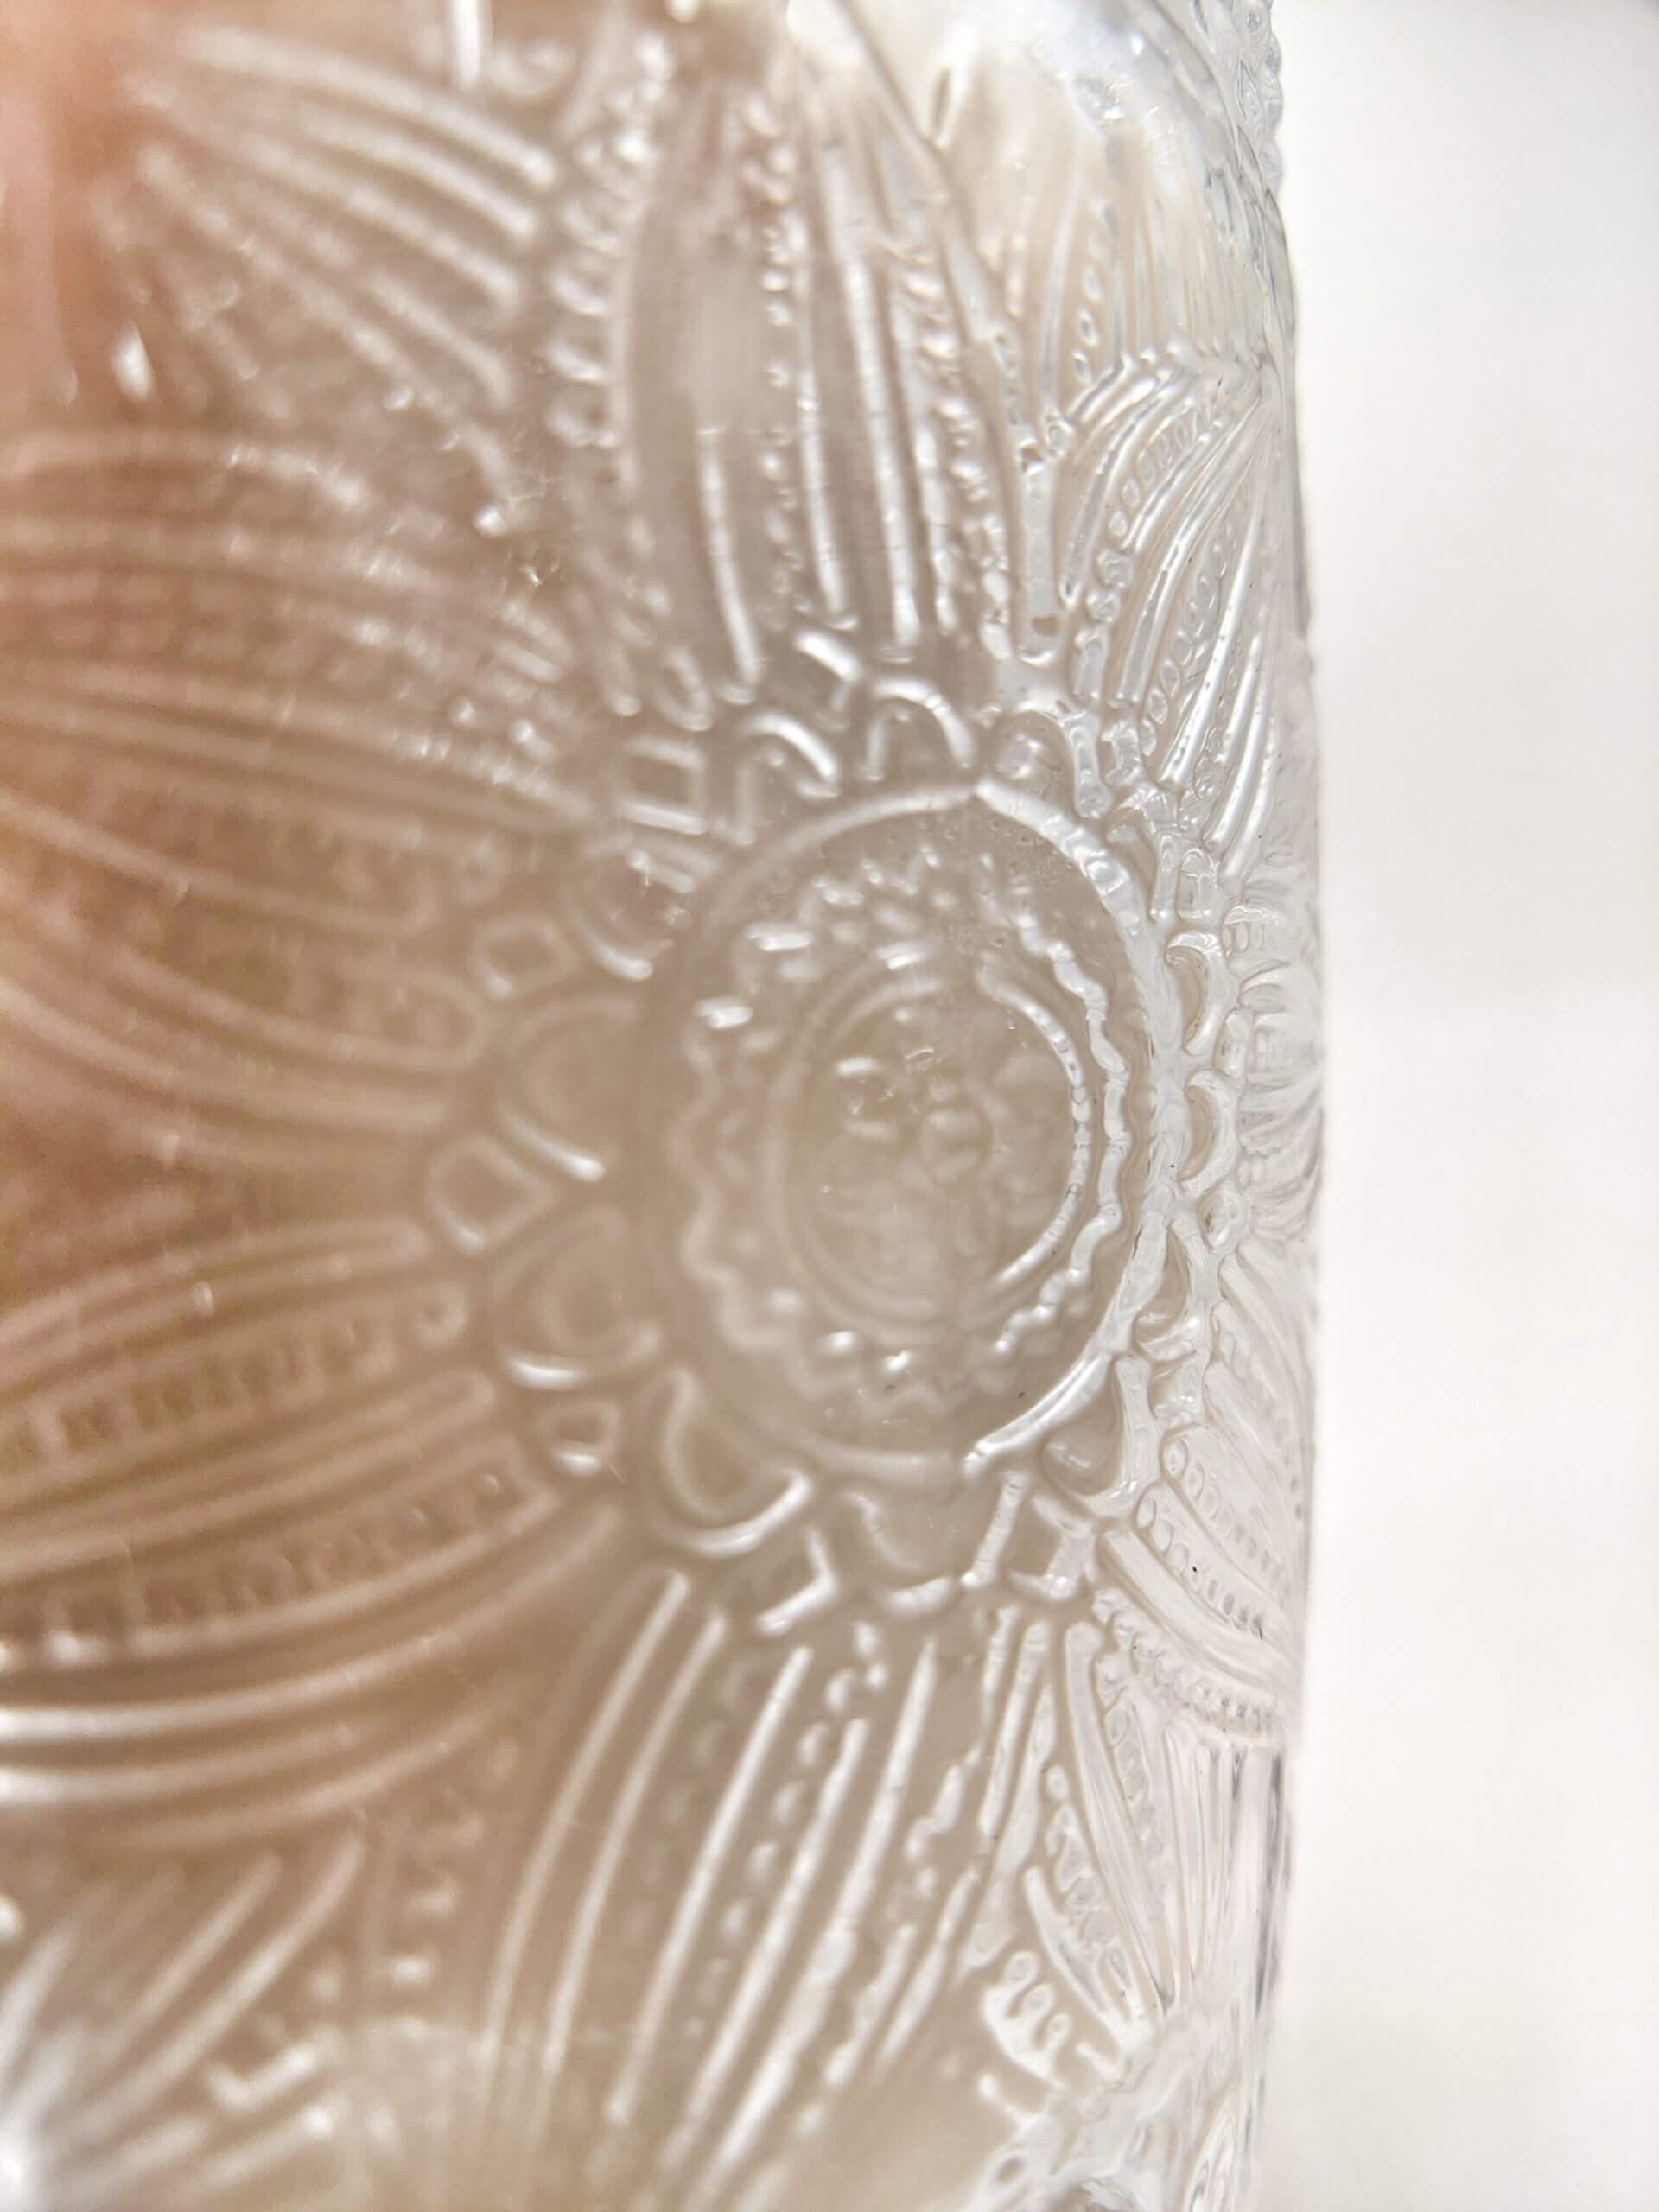 Sweet Vanilla Flower Jar Side Closeup